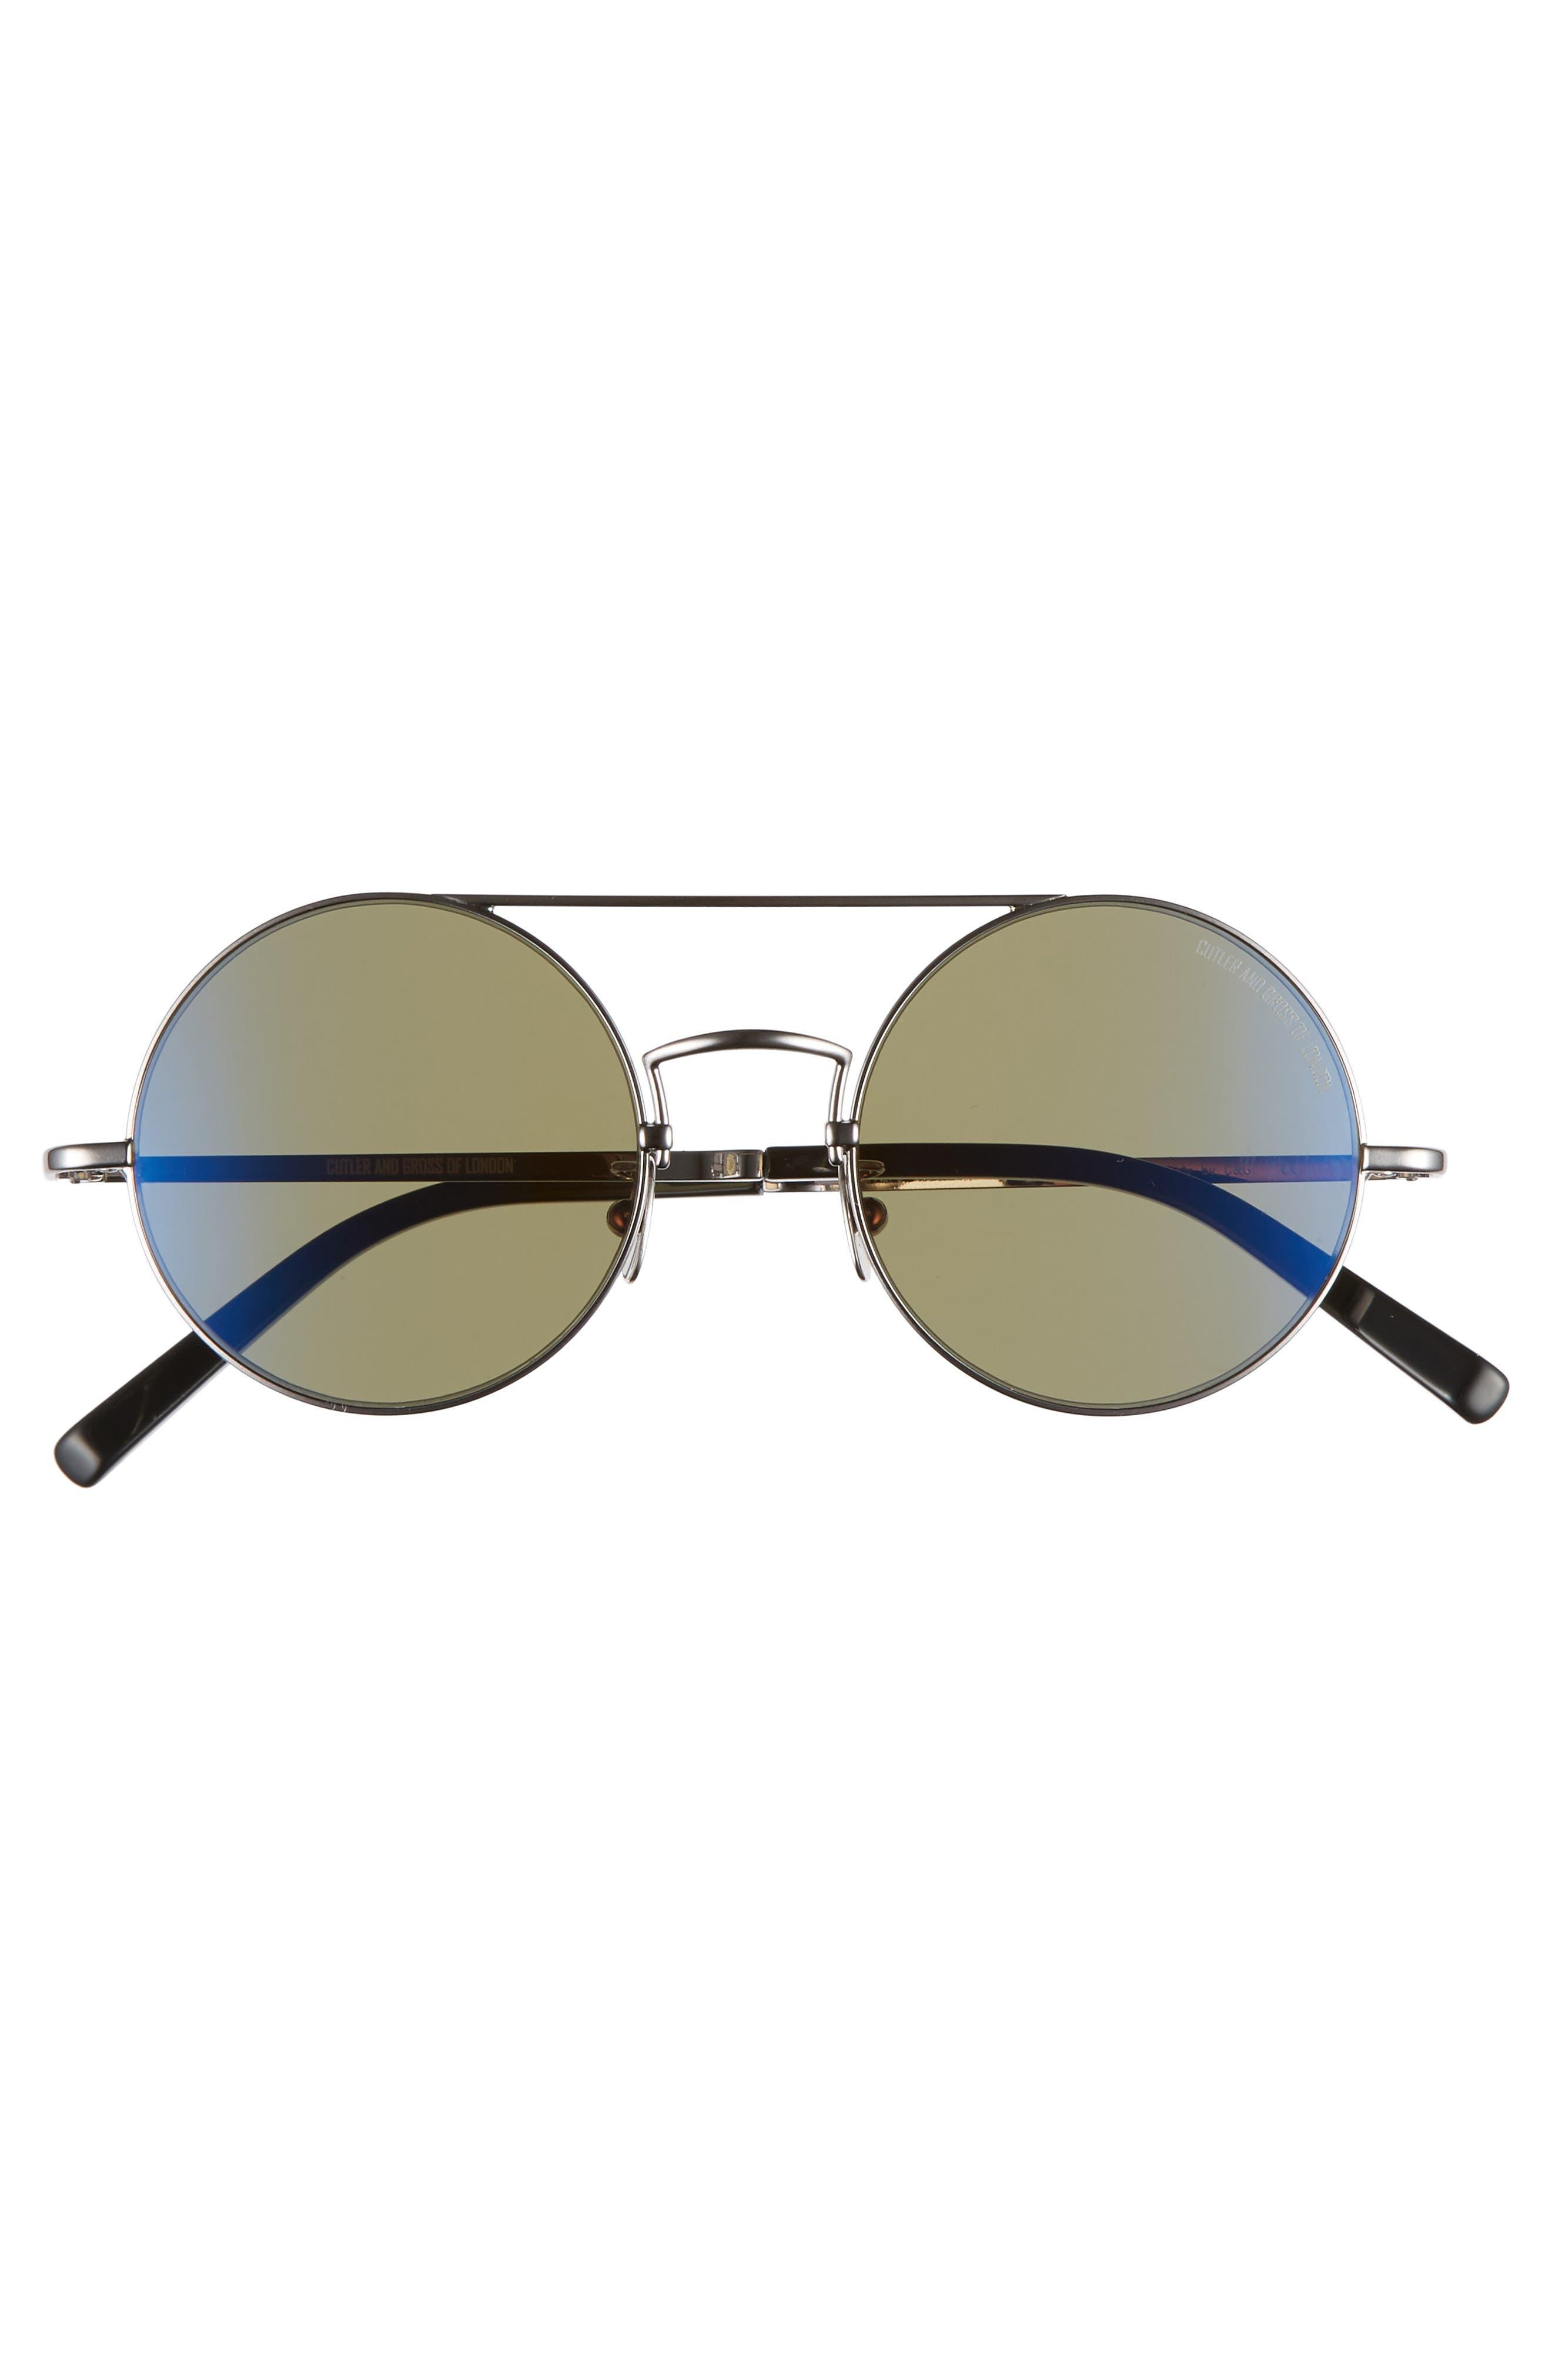 CUTLER AND GROSS, 49mm Polarized Round Sunglasses, Alternate thumbnail 2, color, RUTHENIUM METAL/ DARK GREEN